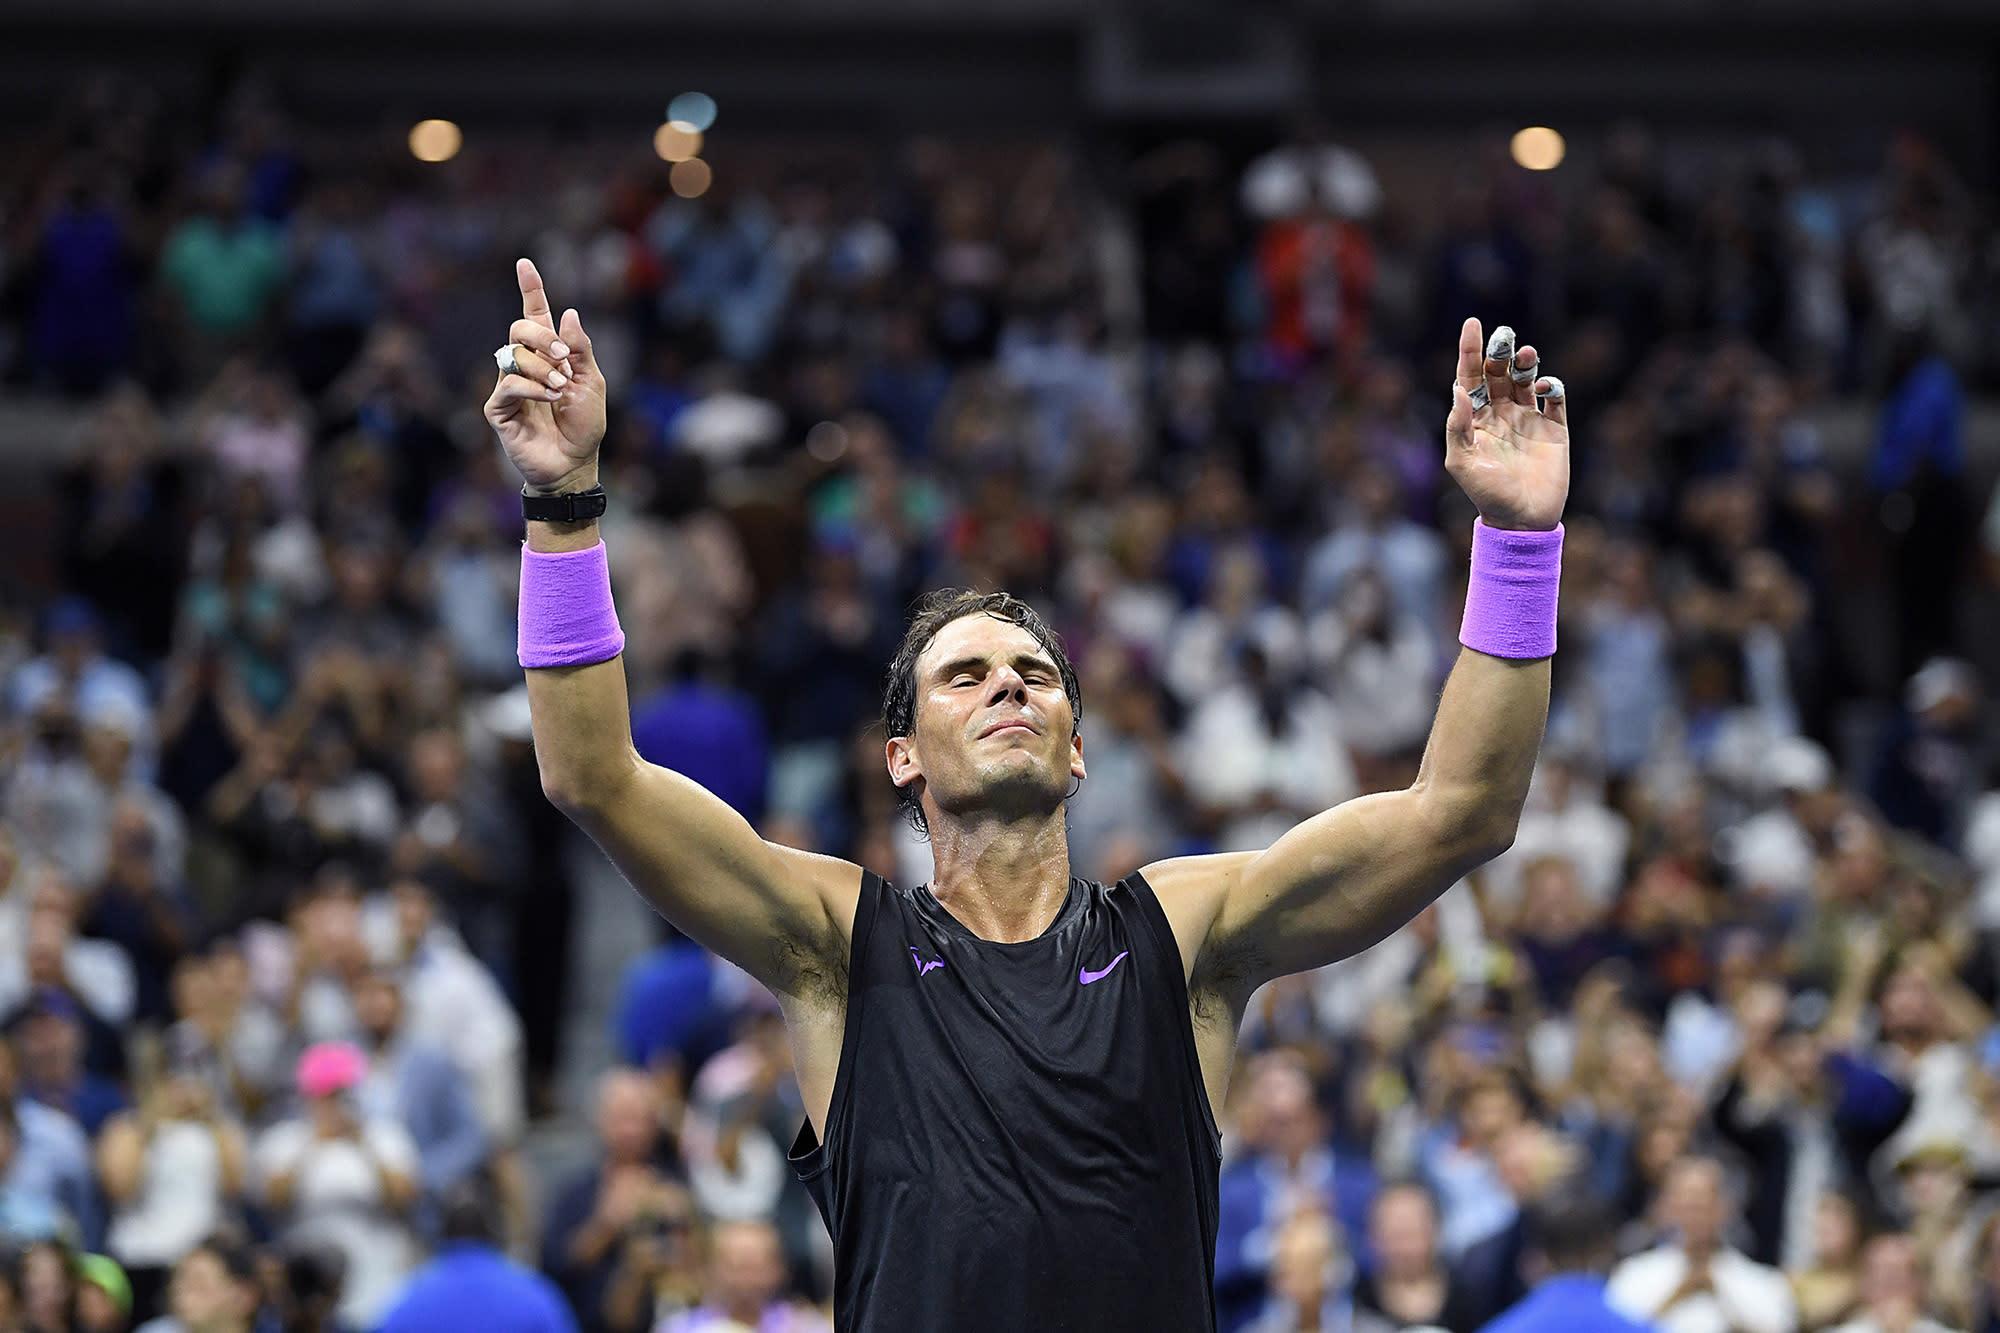 Rafael Nadal Latest To Skip Us Open Won T Defend Title